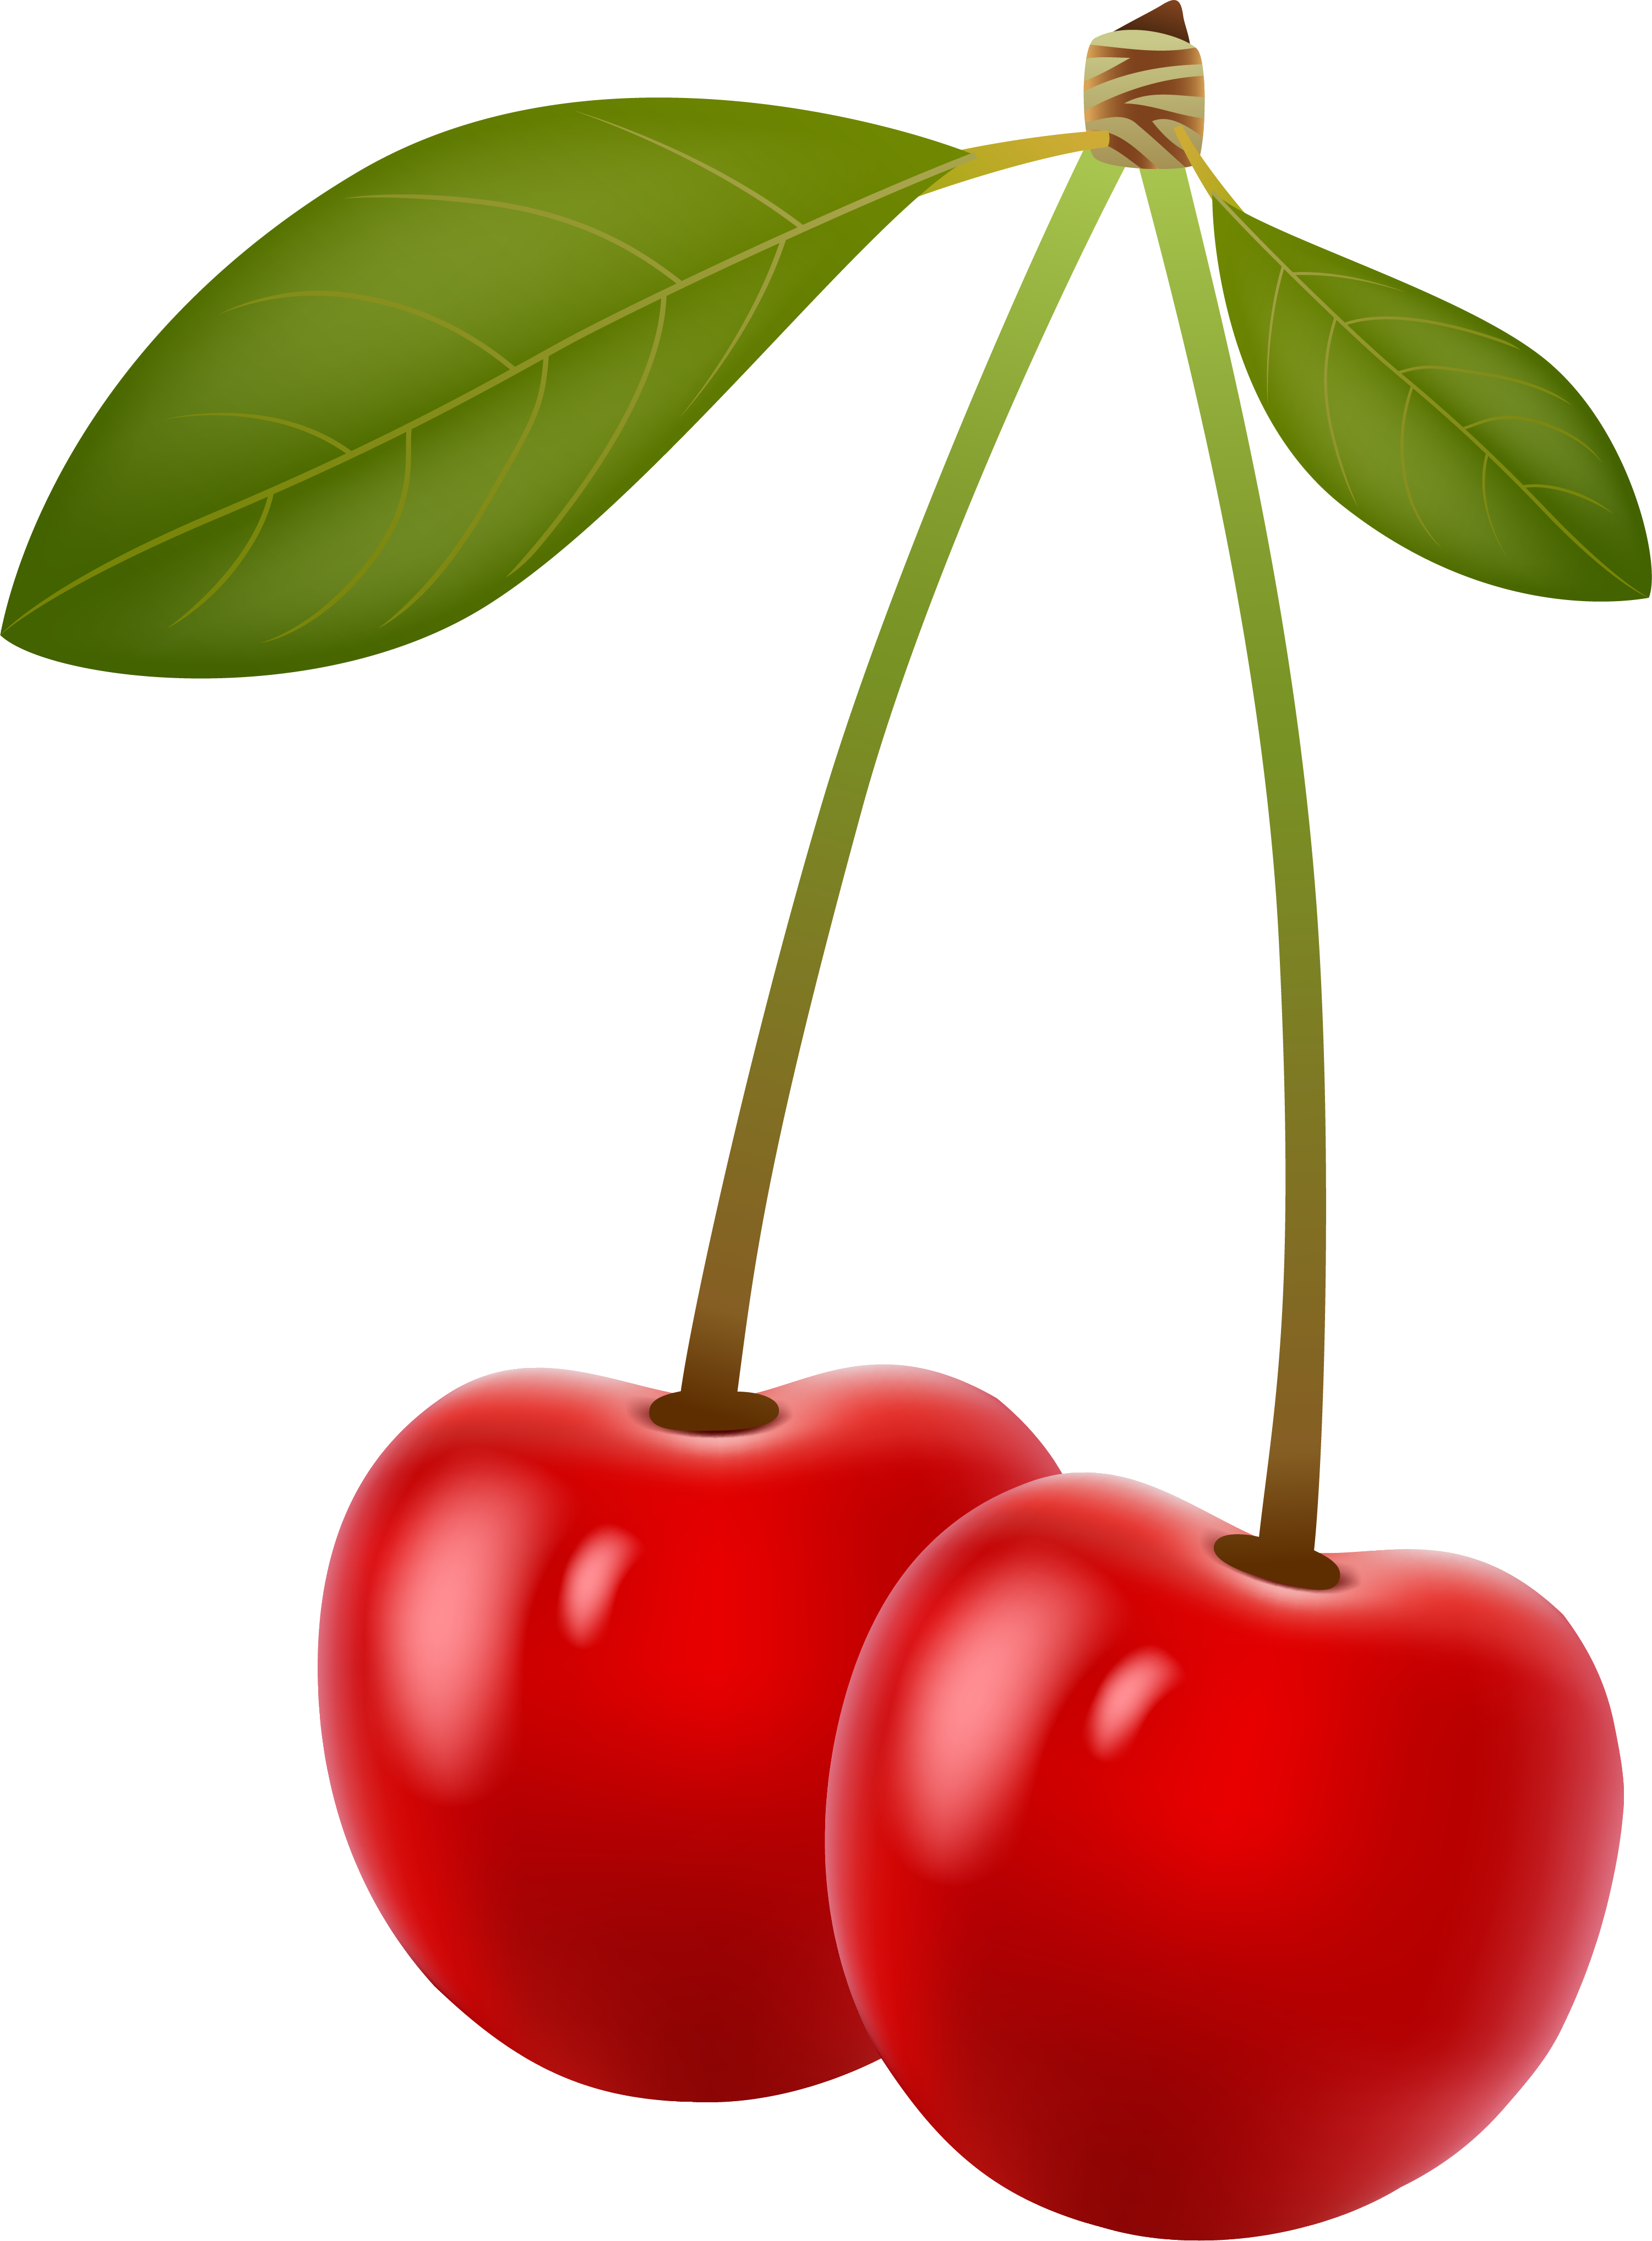 Mango clipart cherry. Berry clip art red